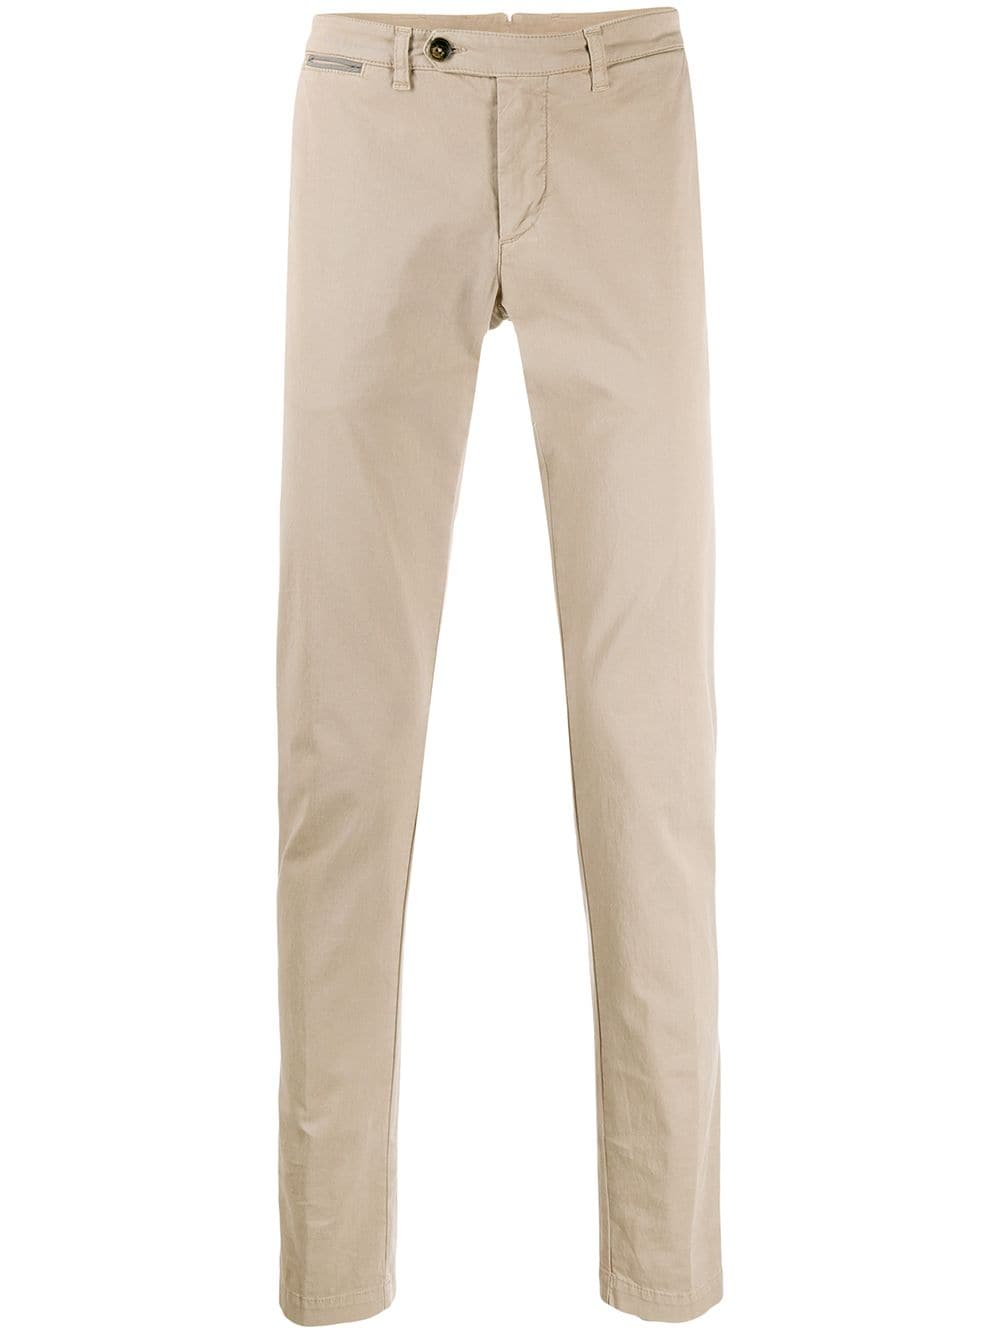 Pantaloni chino a vita bassa in misto cotone beige sabbia ELEVENTY | Pantaloni | A75PANA02-TET0A00303